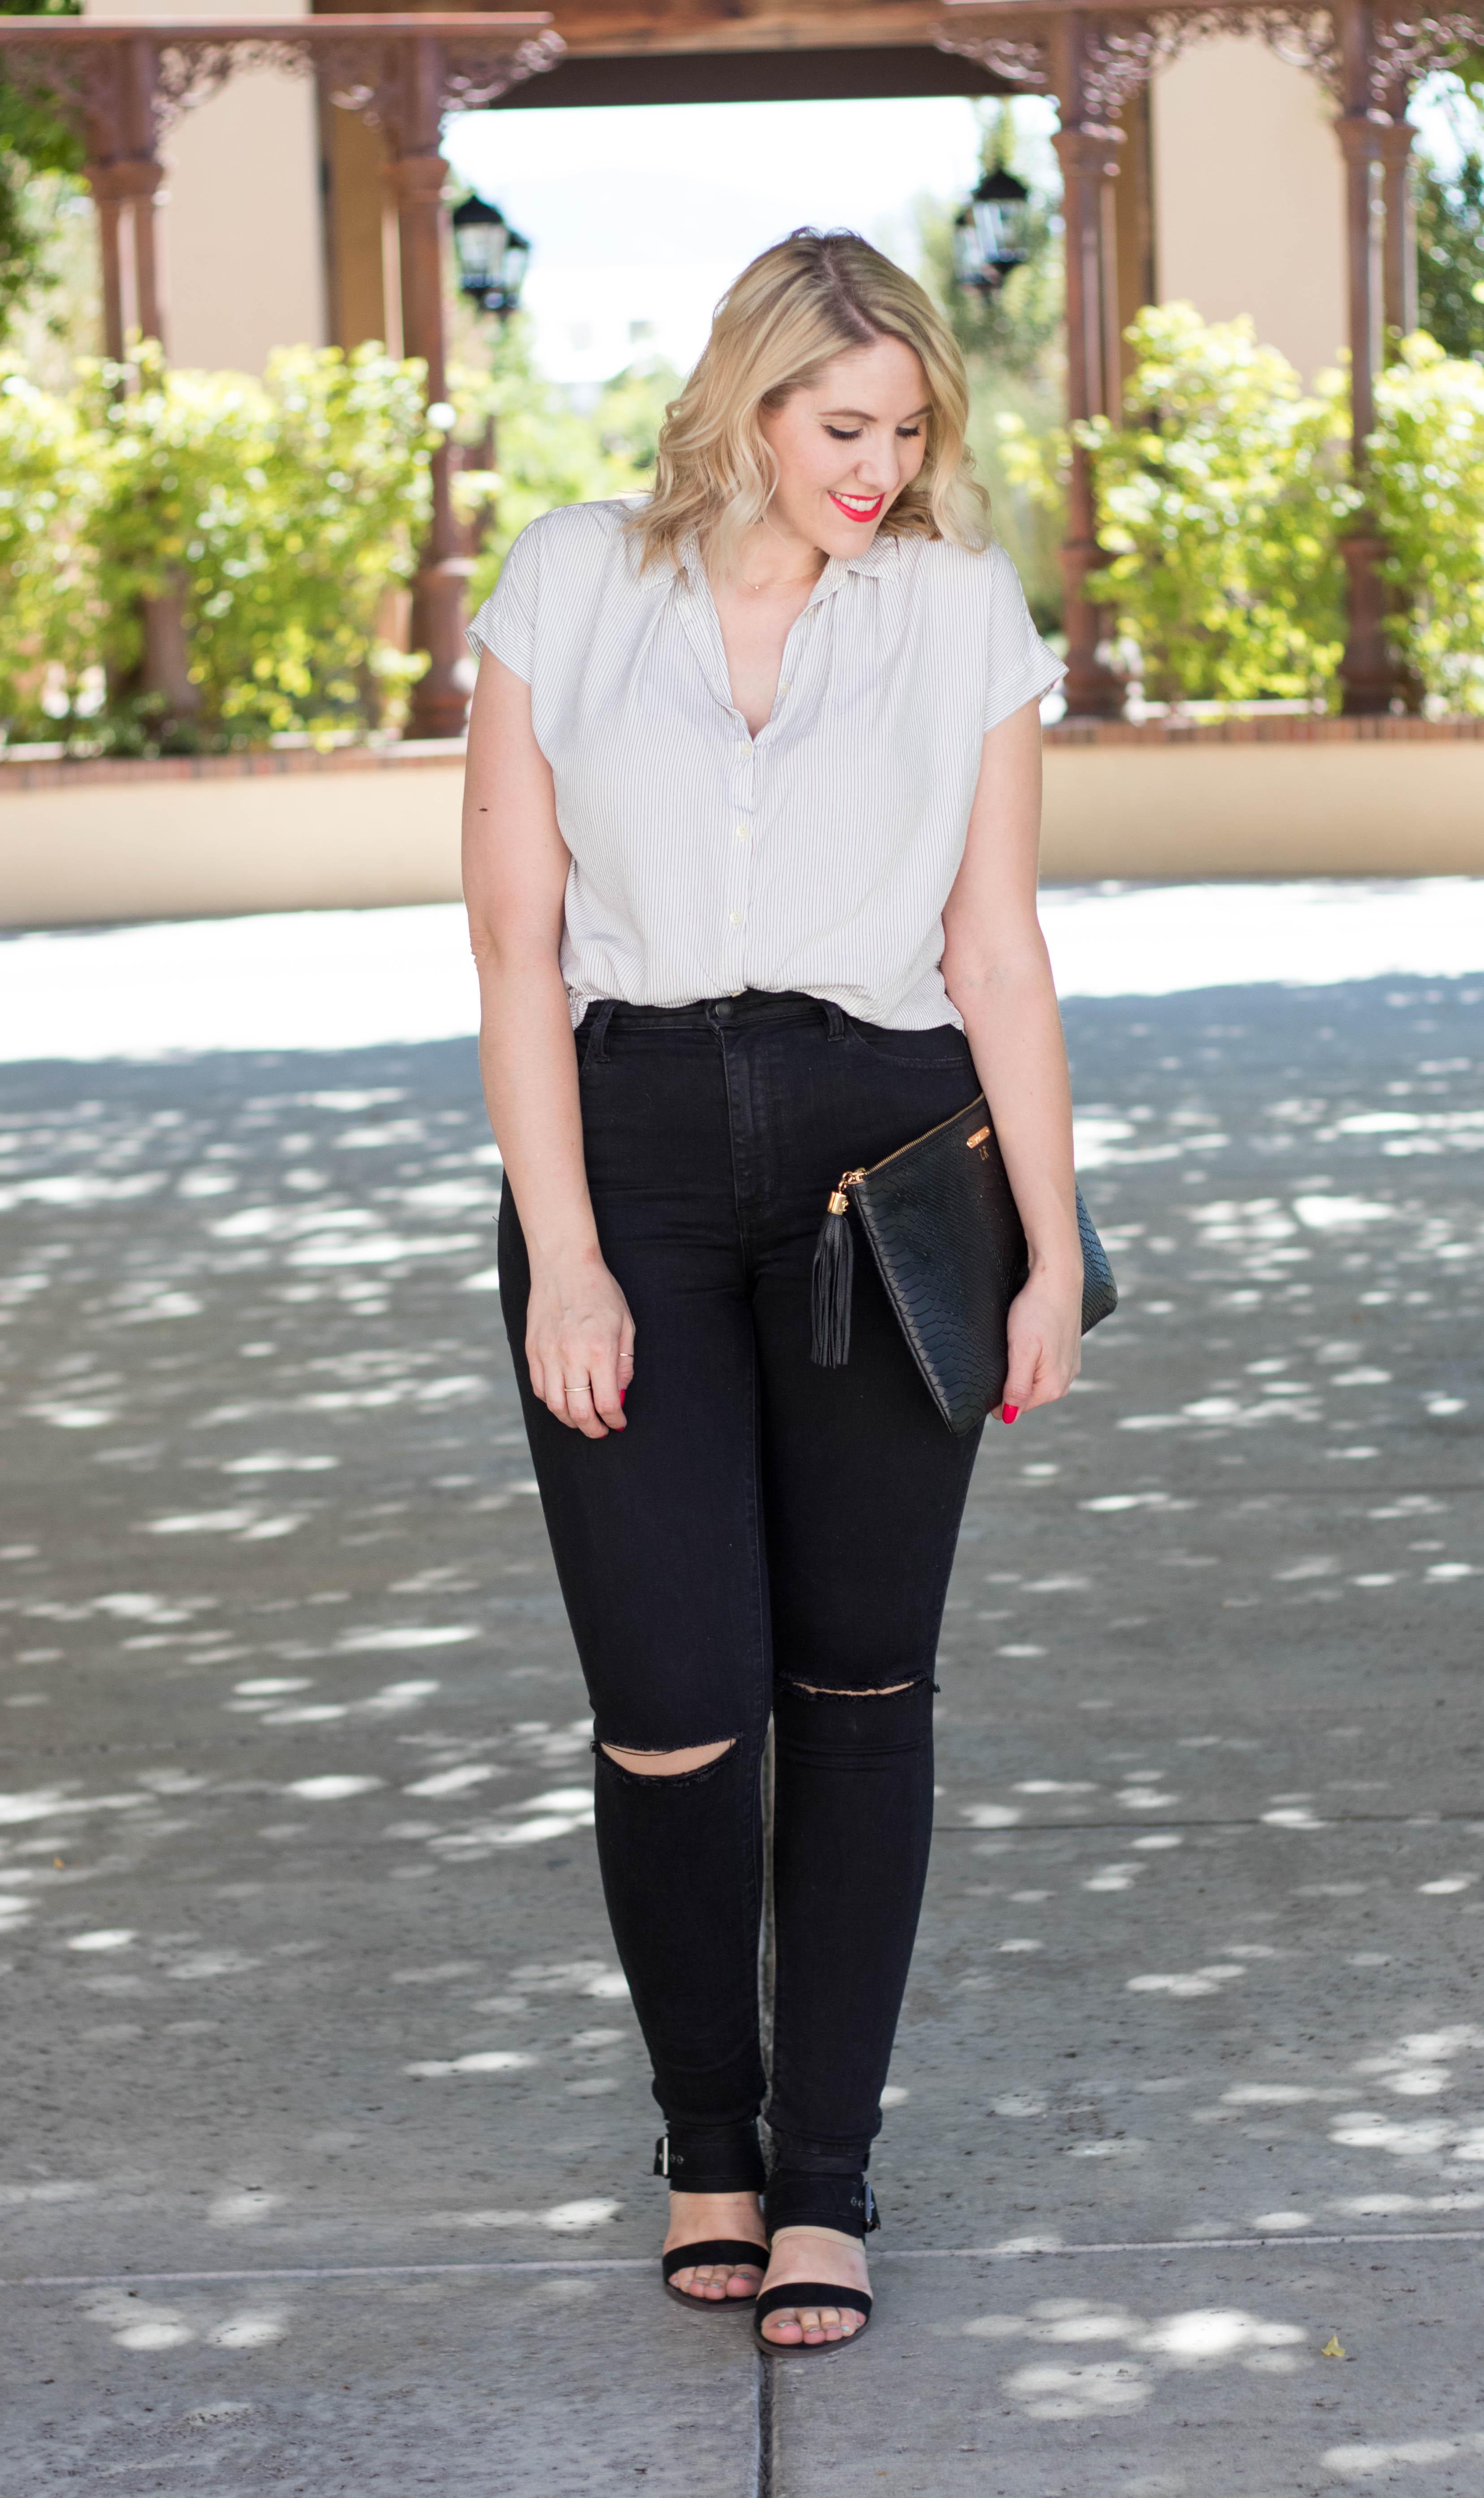 black distressed jeans for tall girls #tallfashion #blackjeans #wiw #fashionblogger